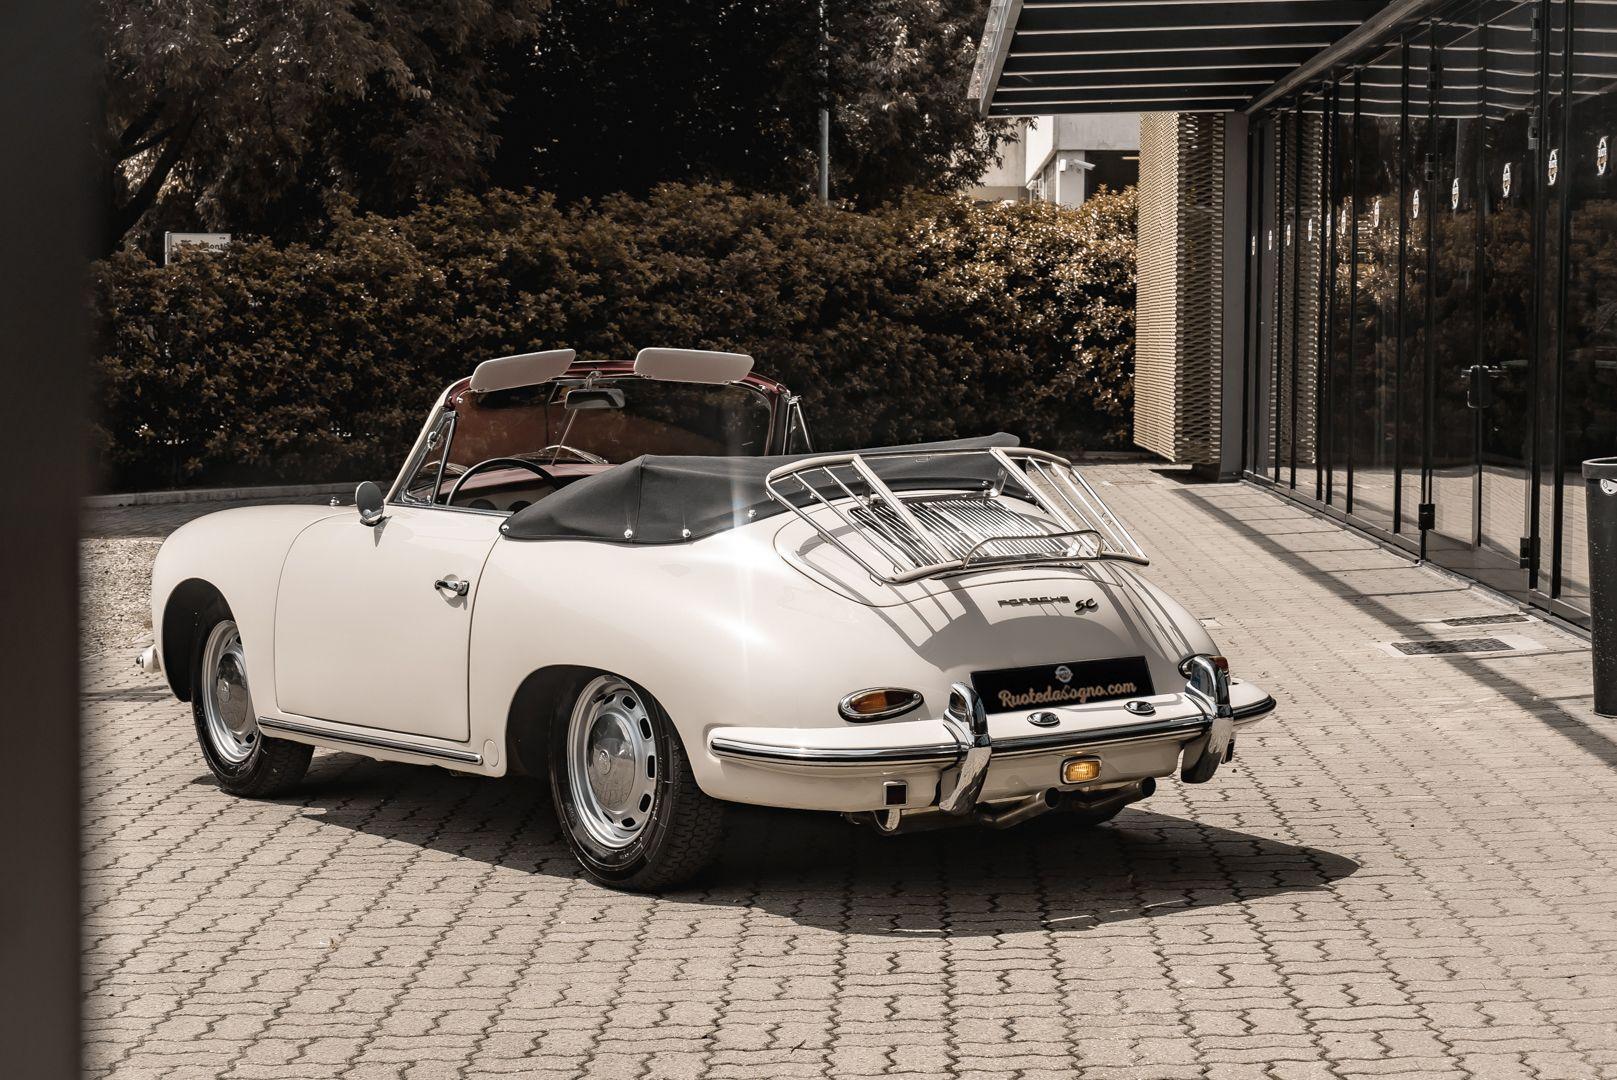 1964 PORSCHE 356 C Cabriolet 1600 SC 75427